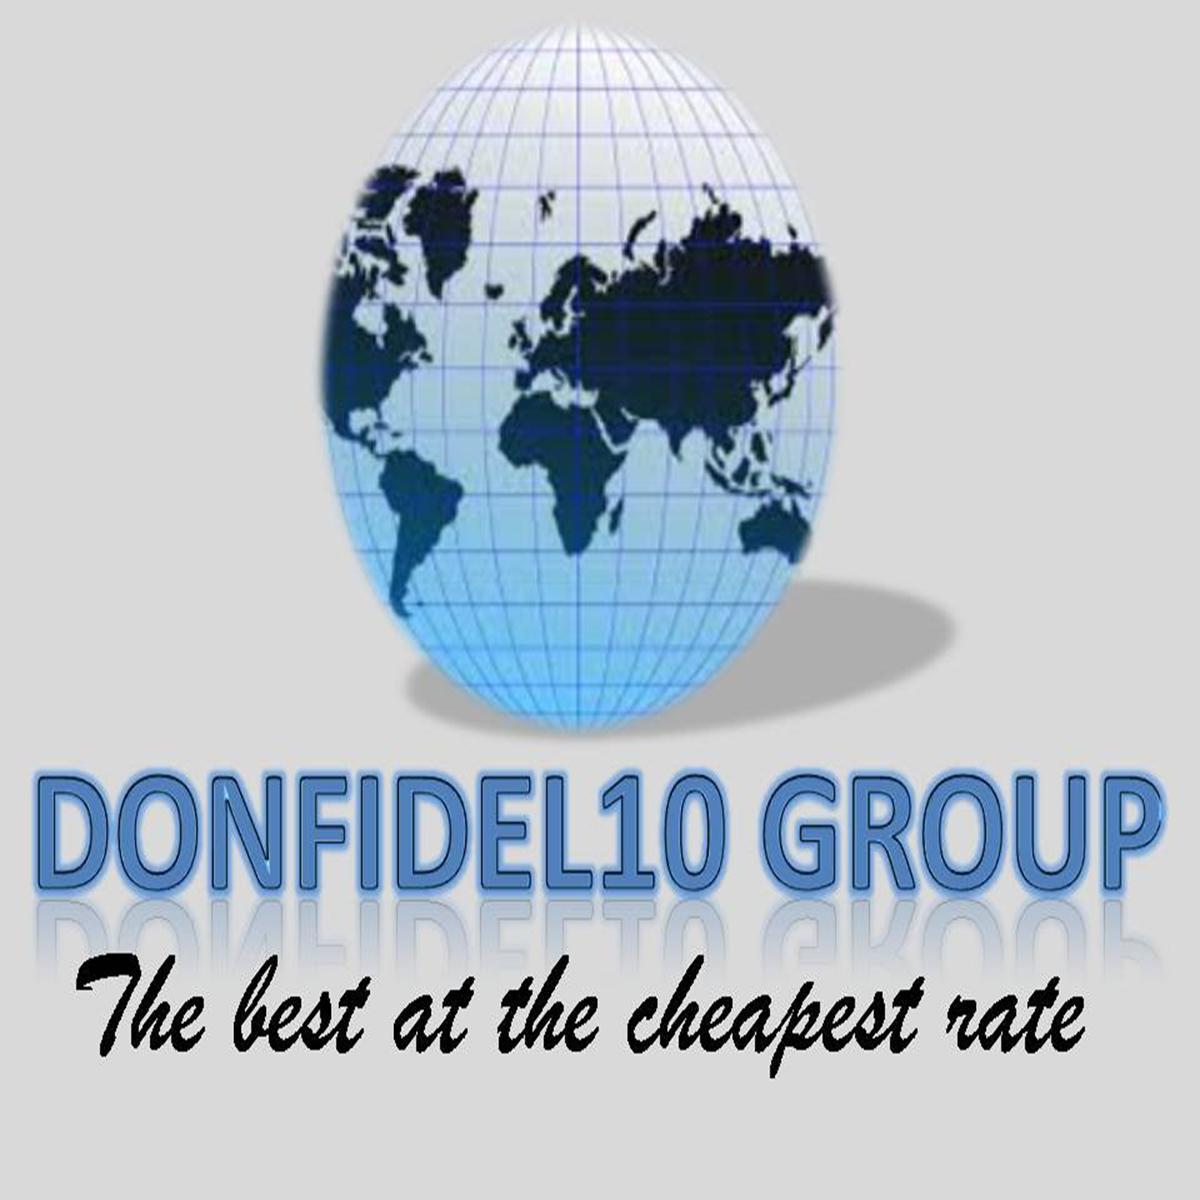 Donfidel10 Group